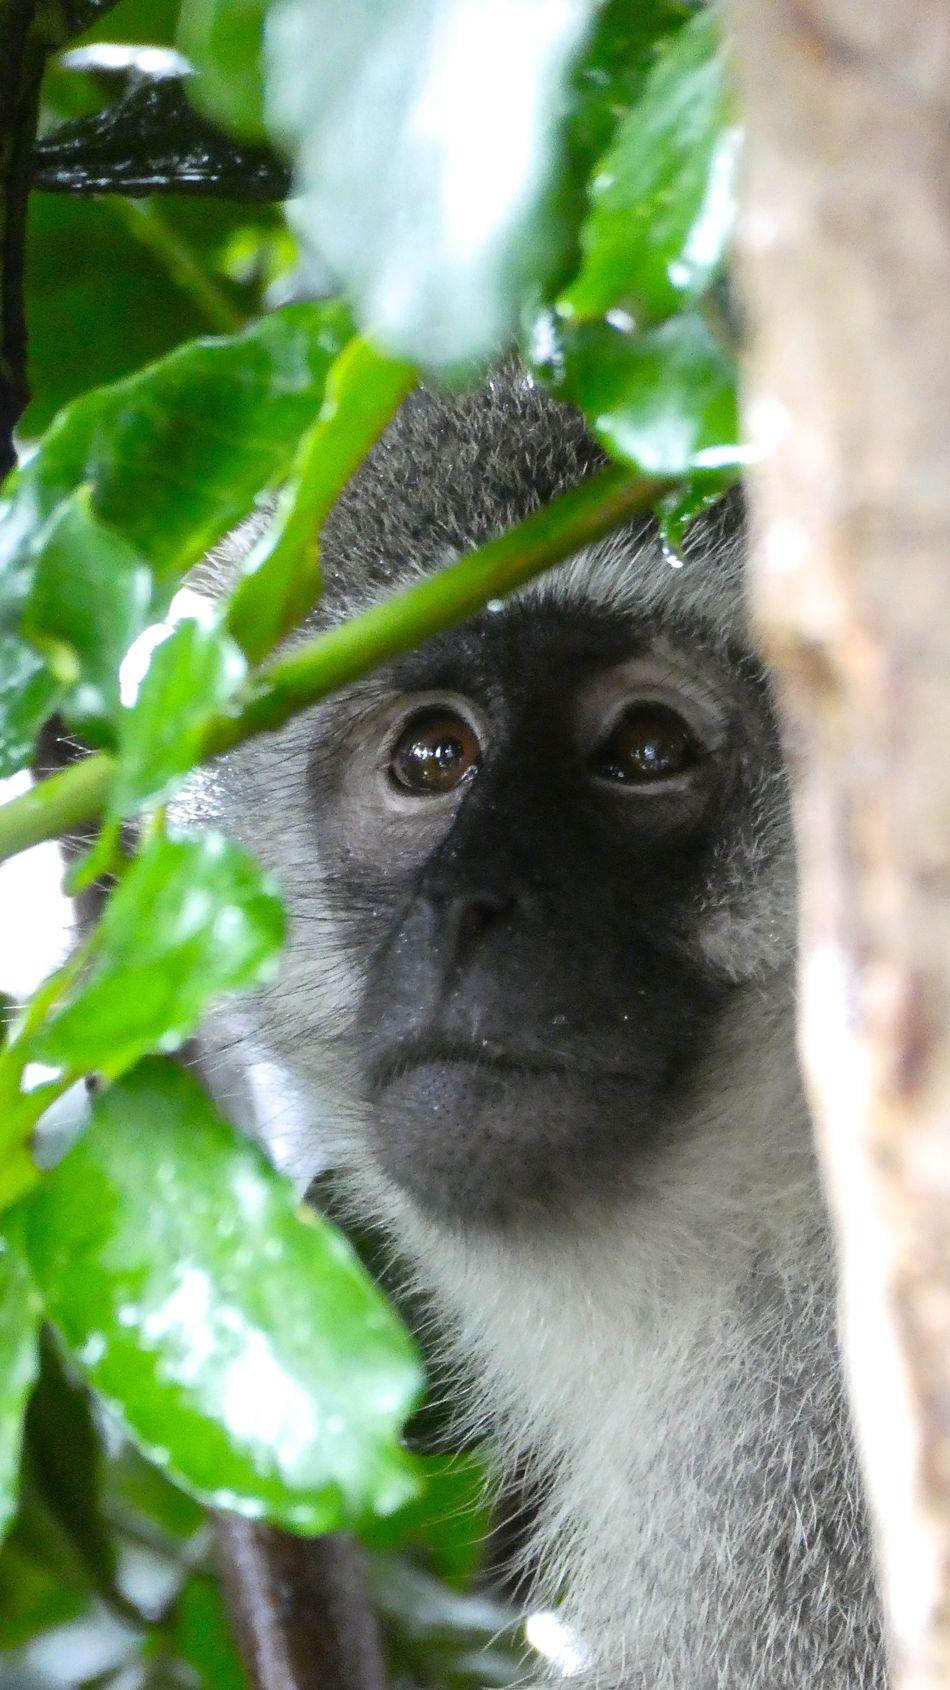 Affen Animal Themes Animals In The Wild Day Grünmeerkatze Grünmeerkatzen Mammal Monkey Monkeys Monkeys Rule Nature No People Outdoors Vervet Vervet Monkey Vervet Monkeys